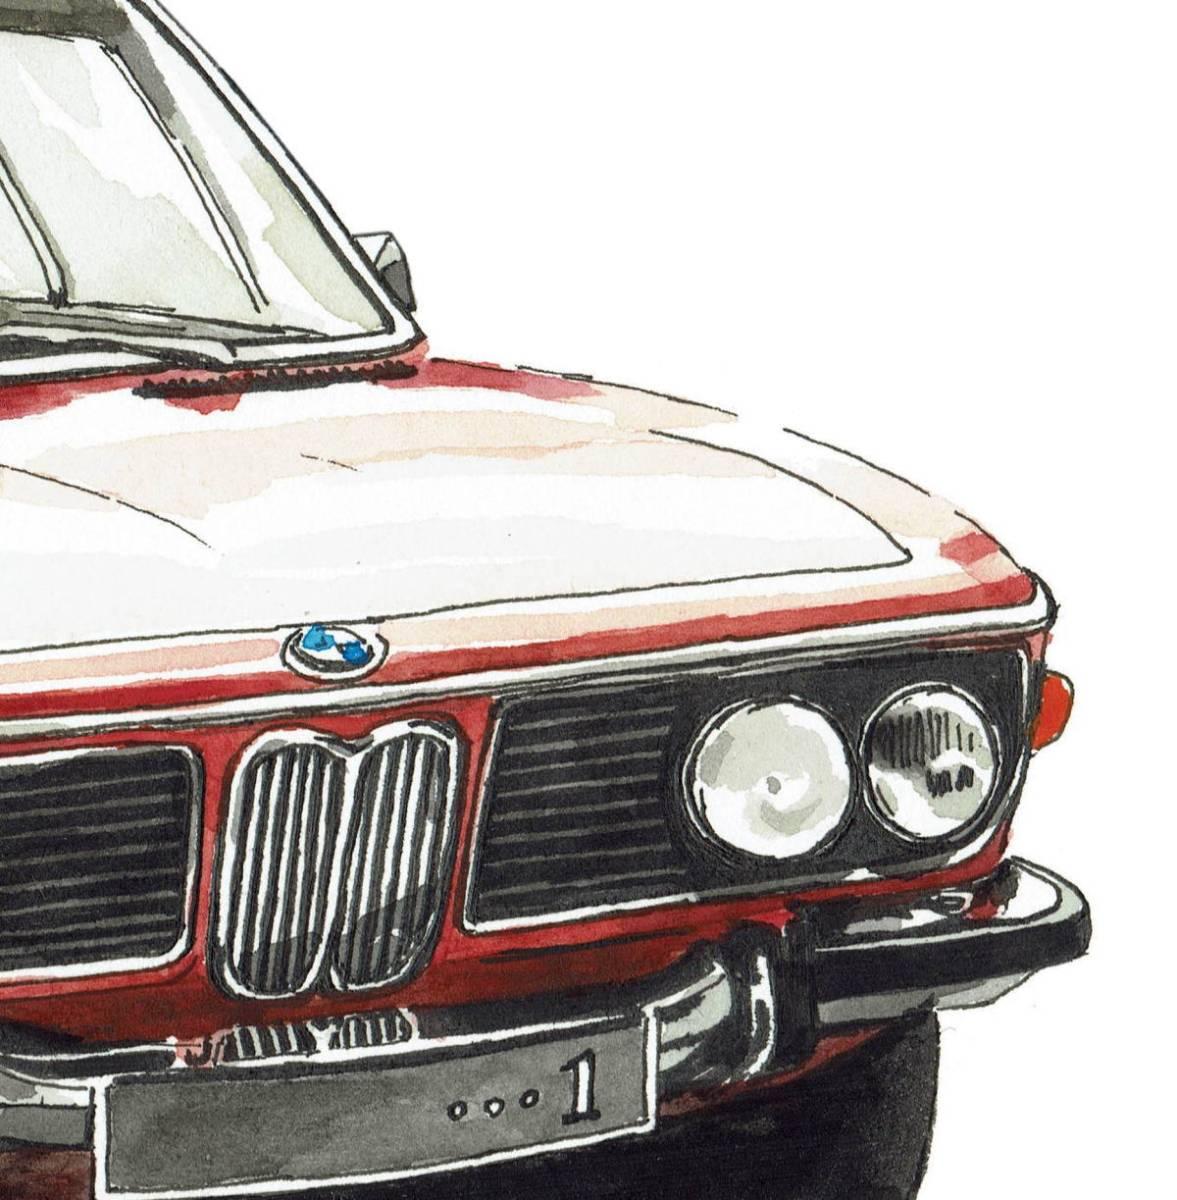 GC-238 BMW 3.0csi/M4 クーペ 限定版画300部 直筆サイン有 額装済●作家 平右ヱ門_画像6